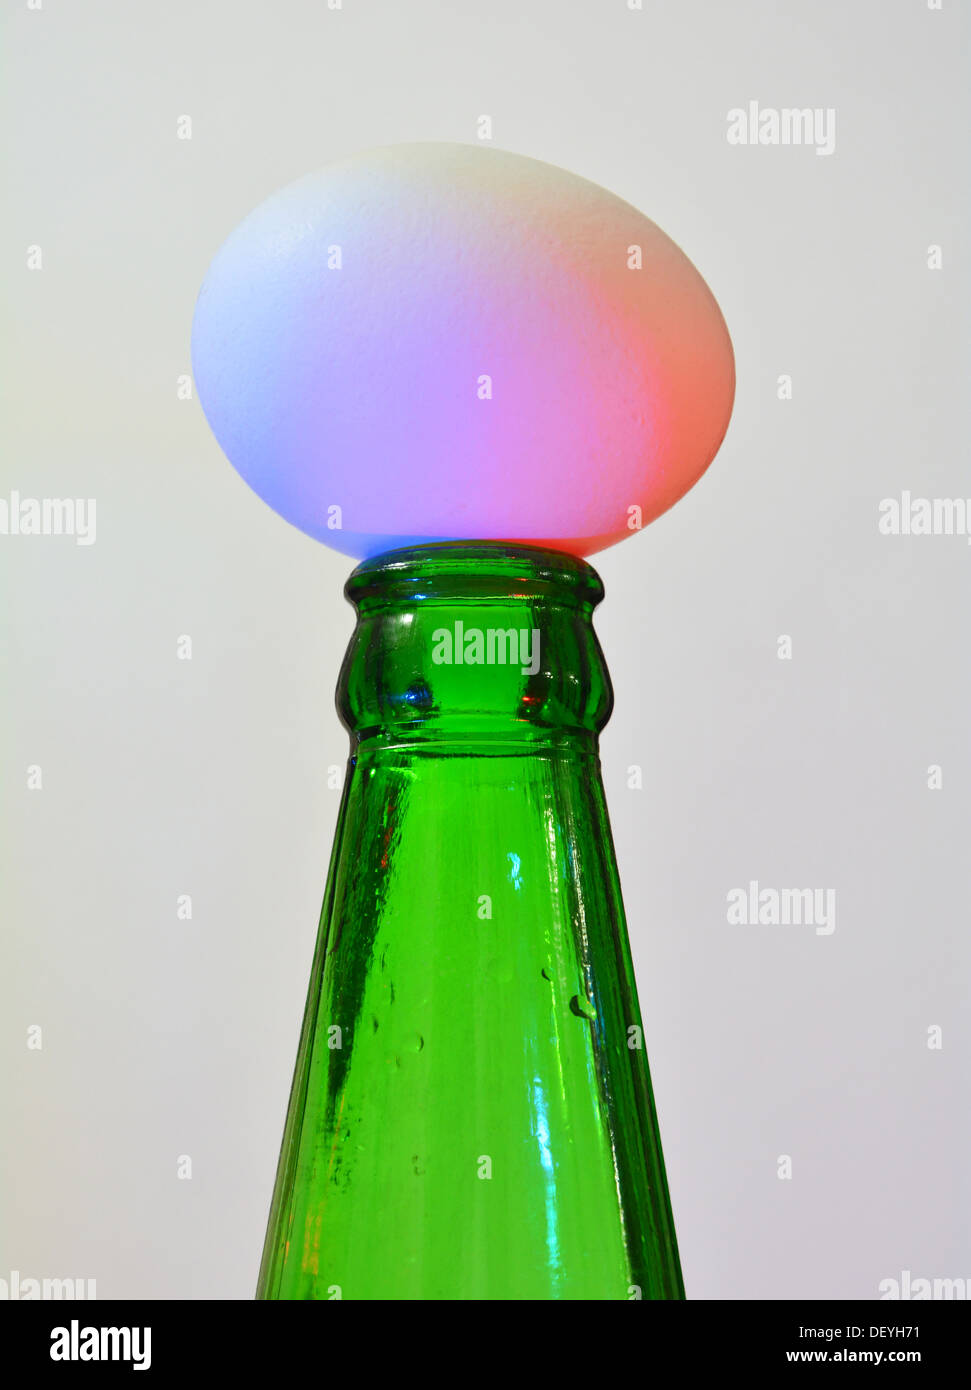 Egg balanced on beer bottle - Stock Image